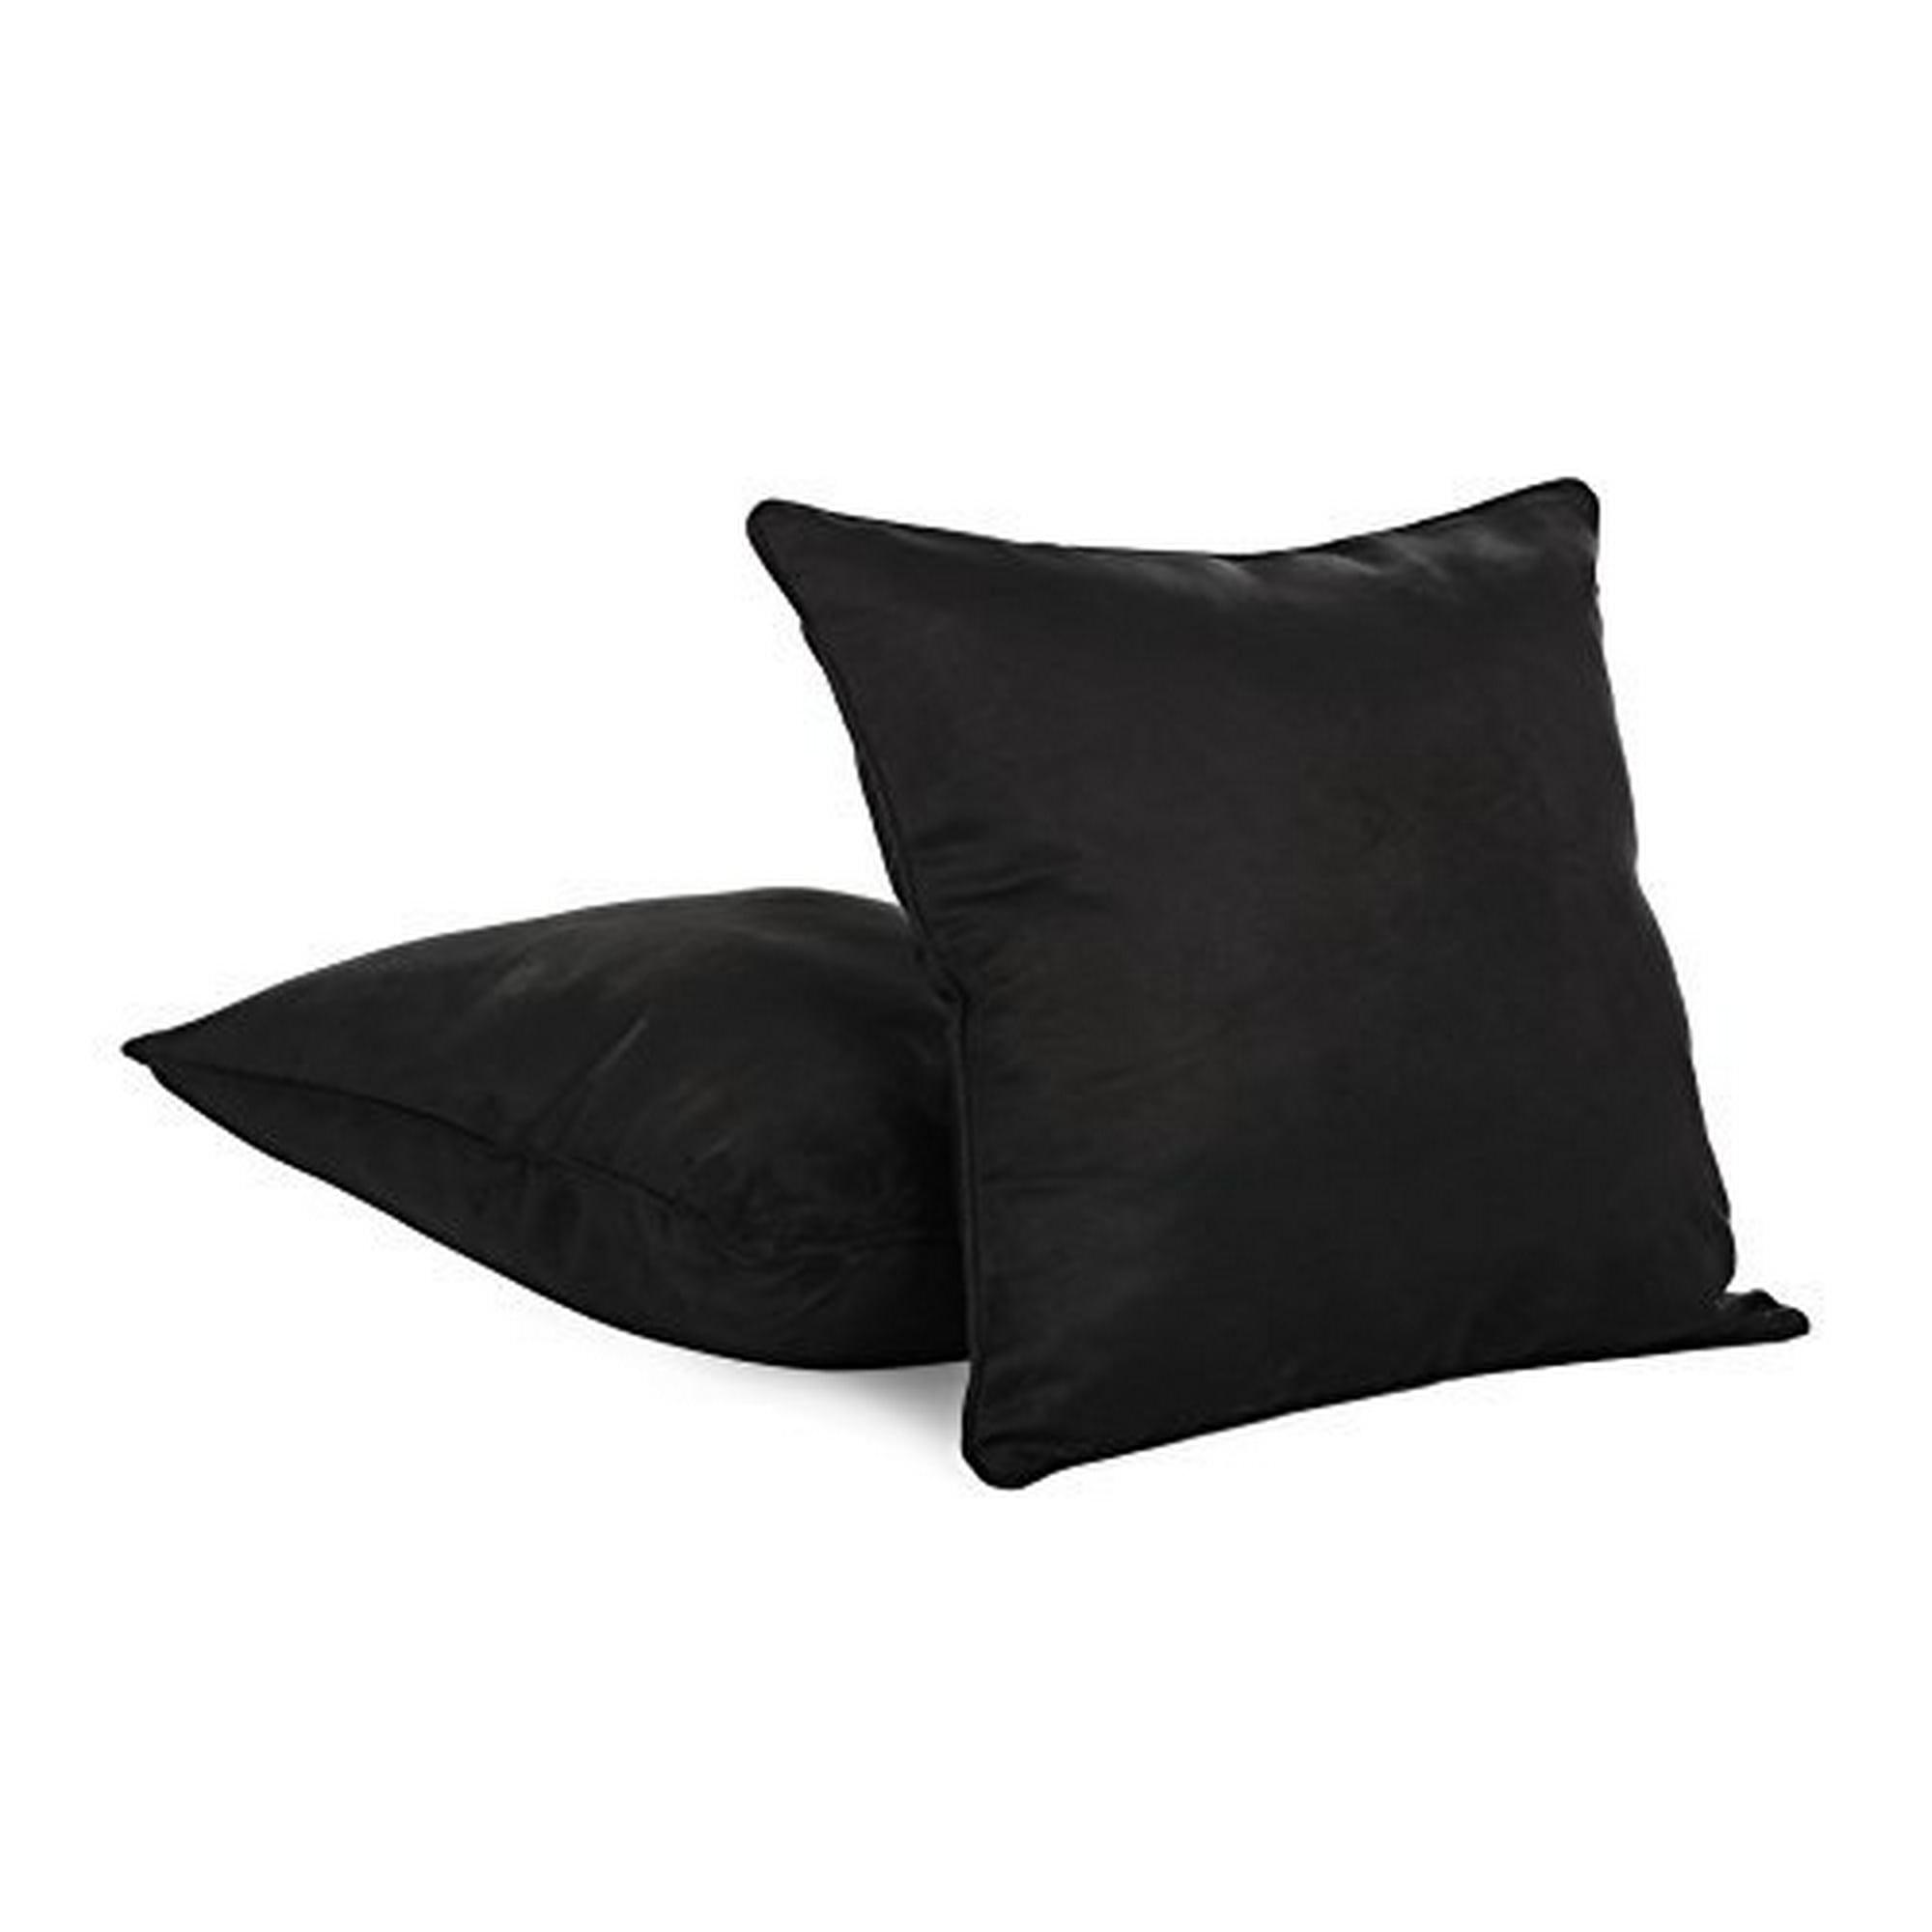 Groovy Super Soft Faux Suede Decorative Euro Pillow Cover With Inzonedesignstudio Interior Chair Design Inzonedesignstudiocom